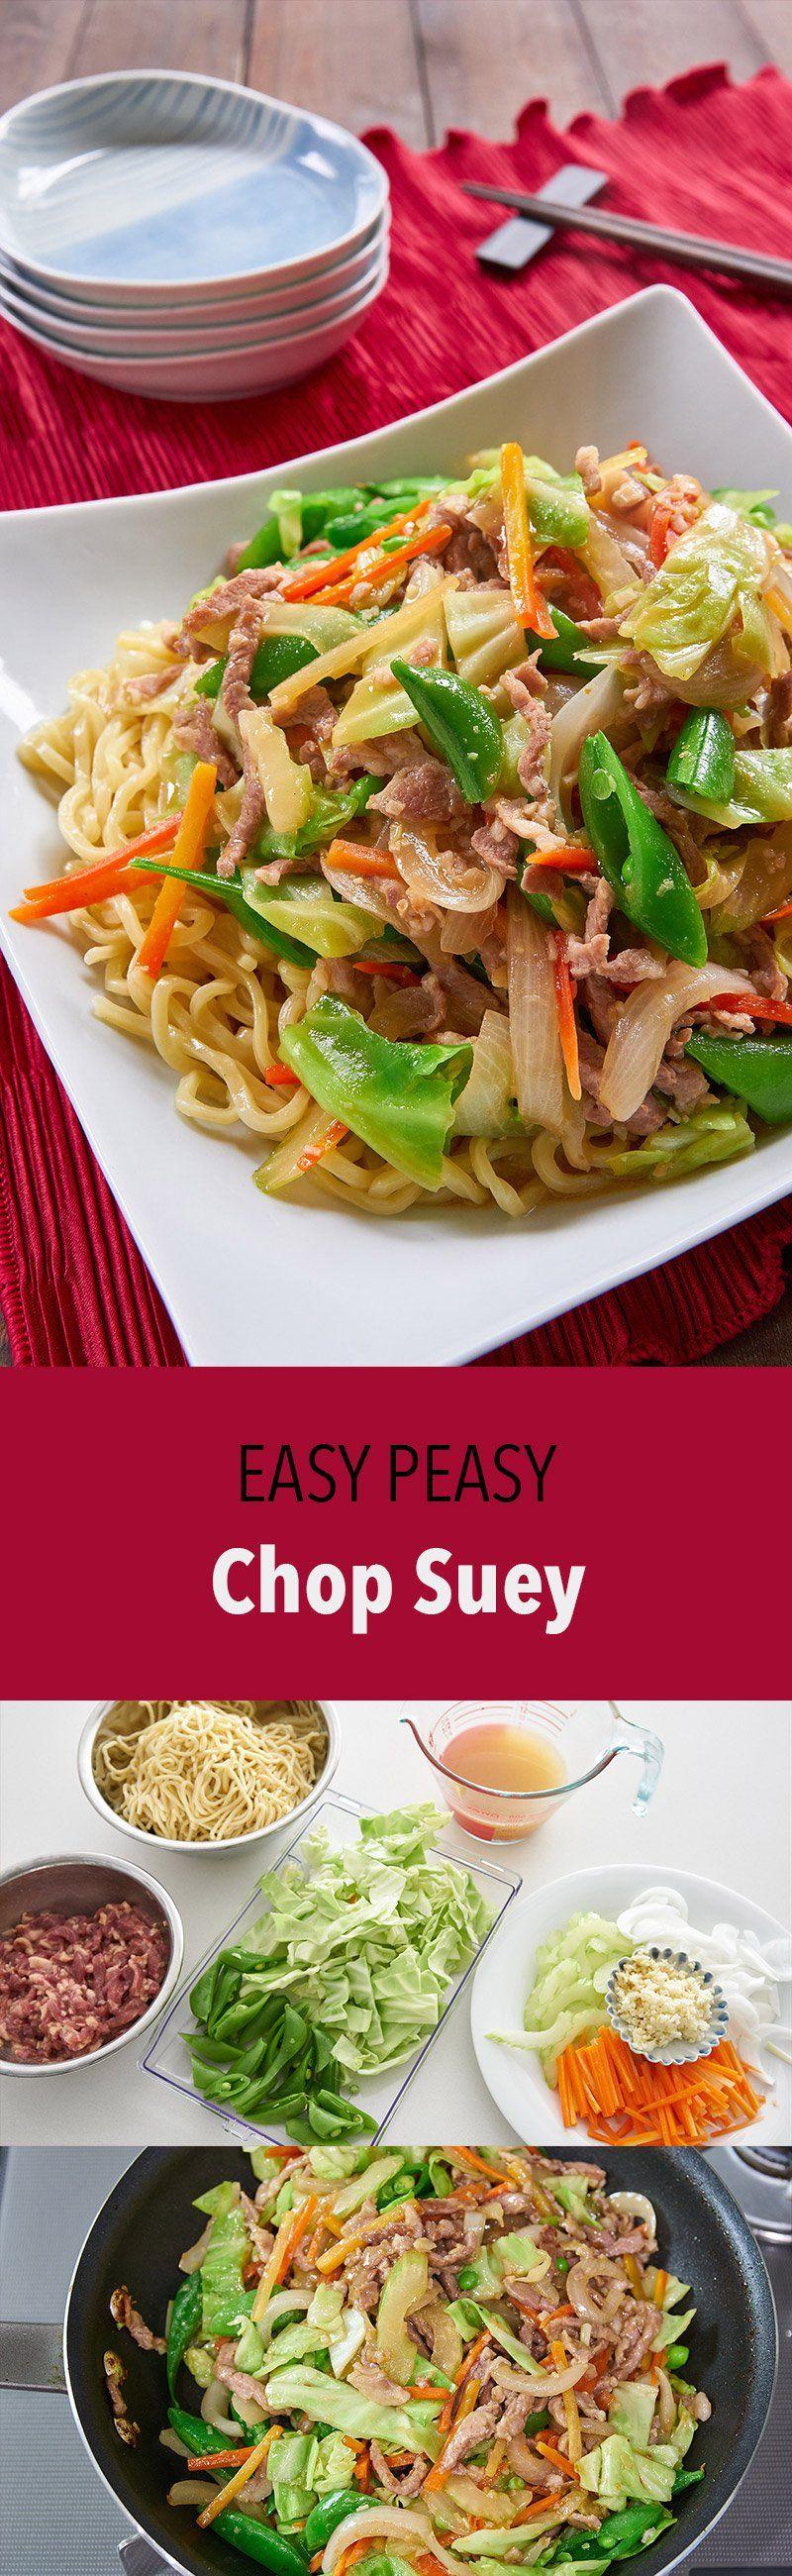 Chop Suey Asian Recipes Recipes Chop Suey